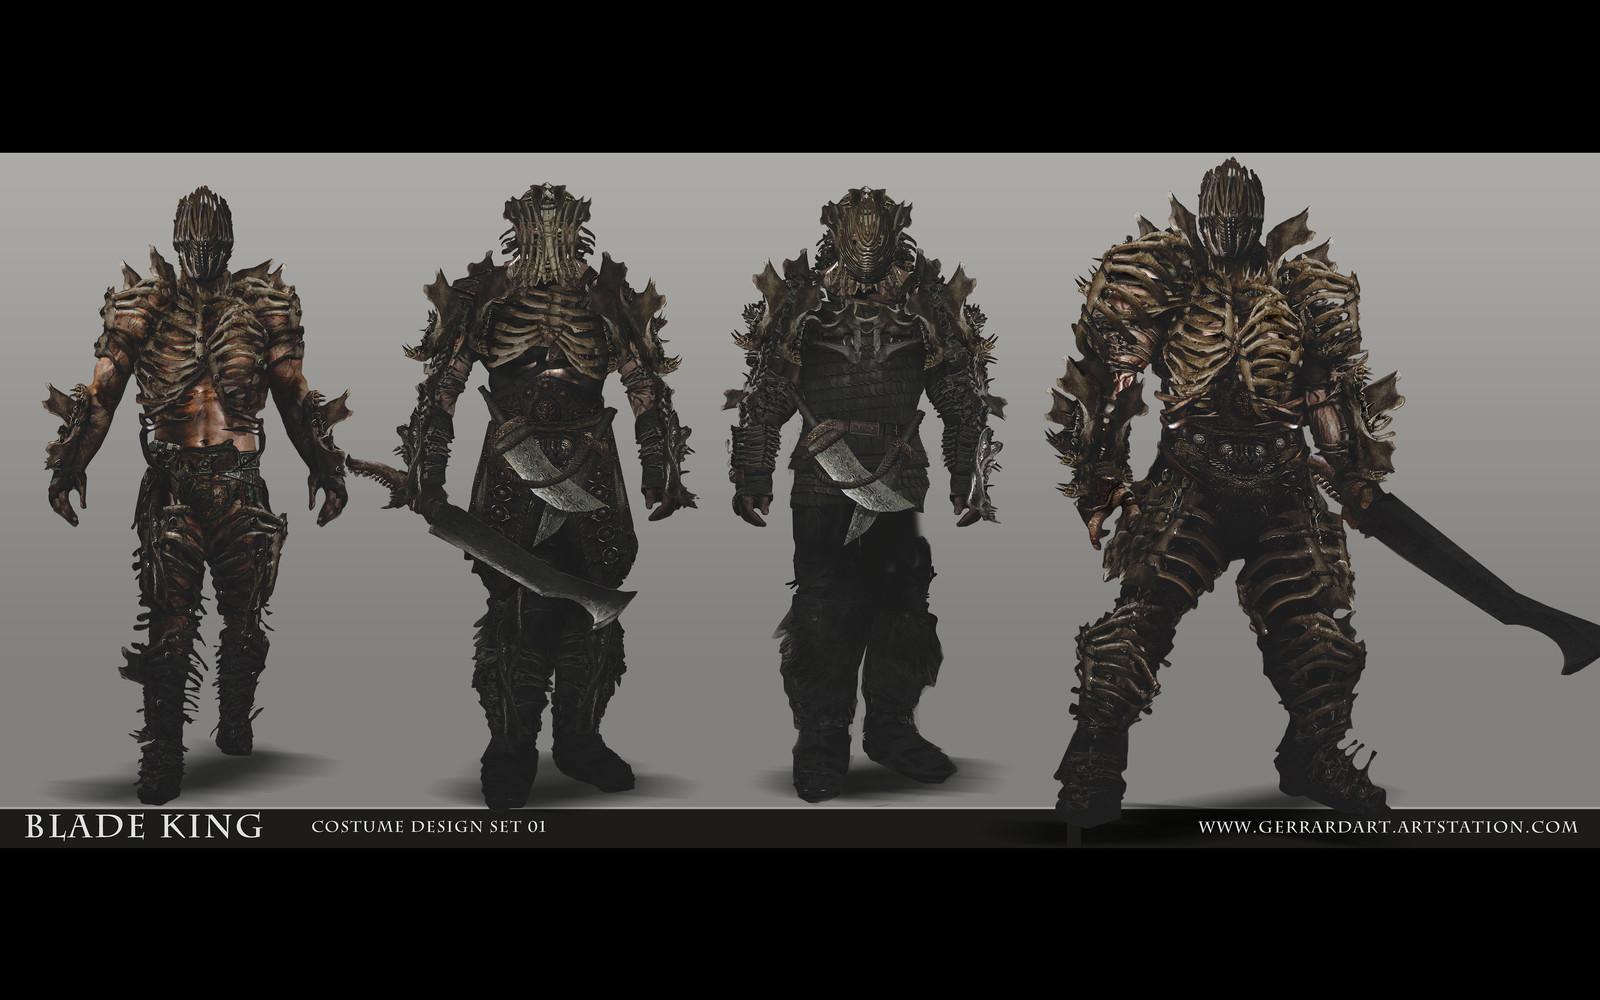 BLADE KING : COSTUME DESIGNS / SET 02